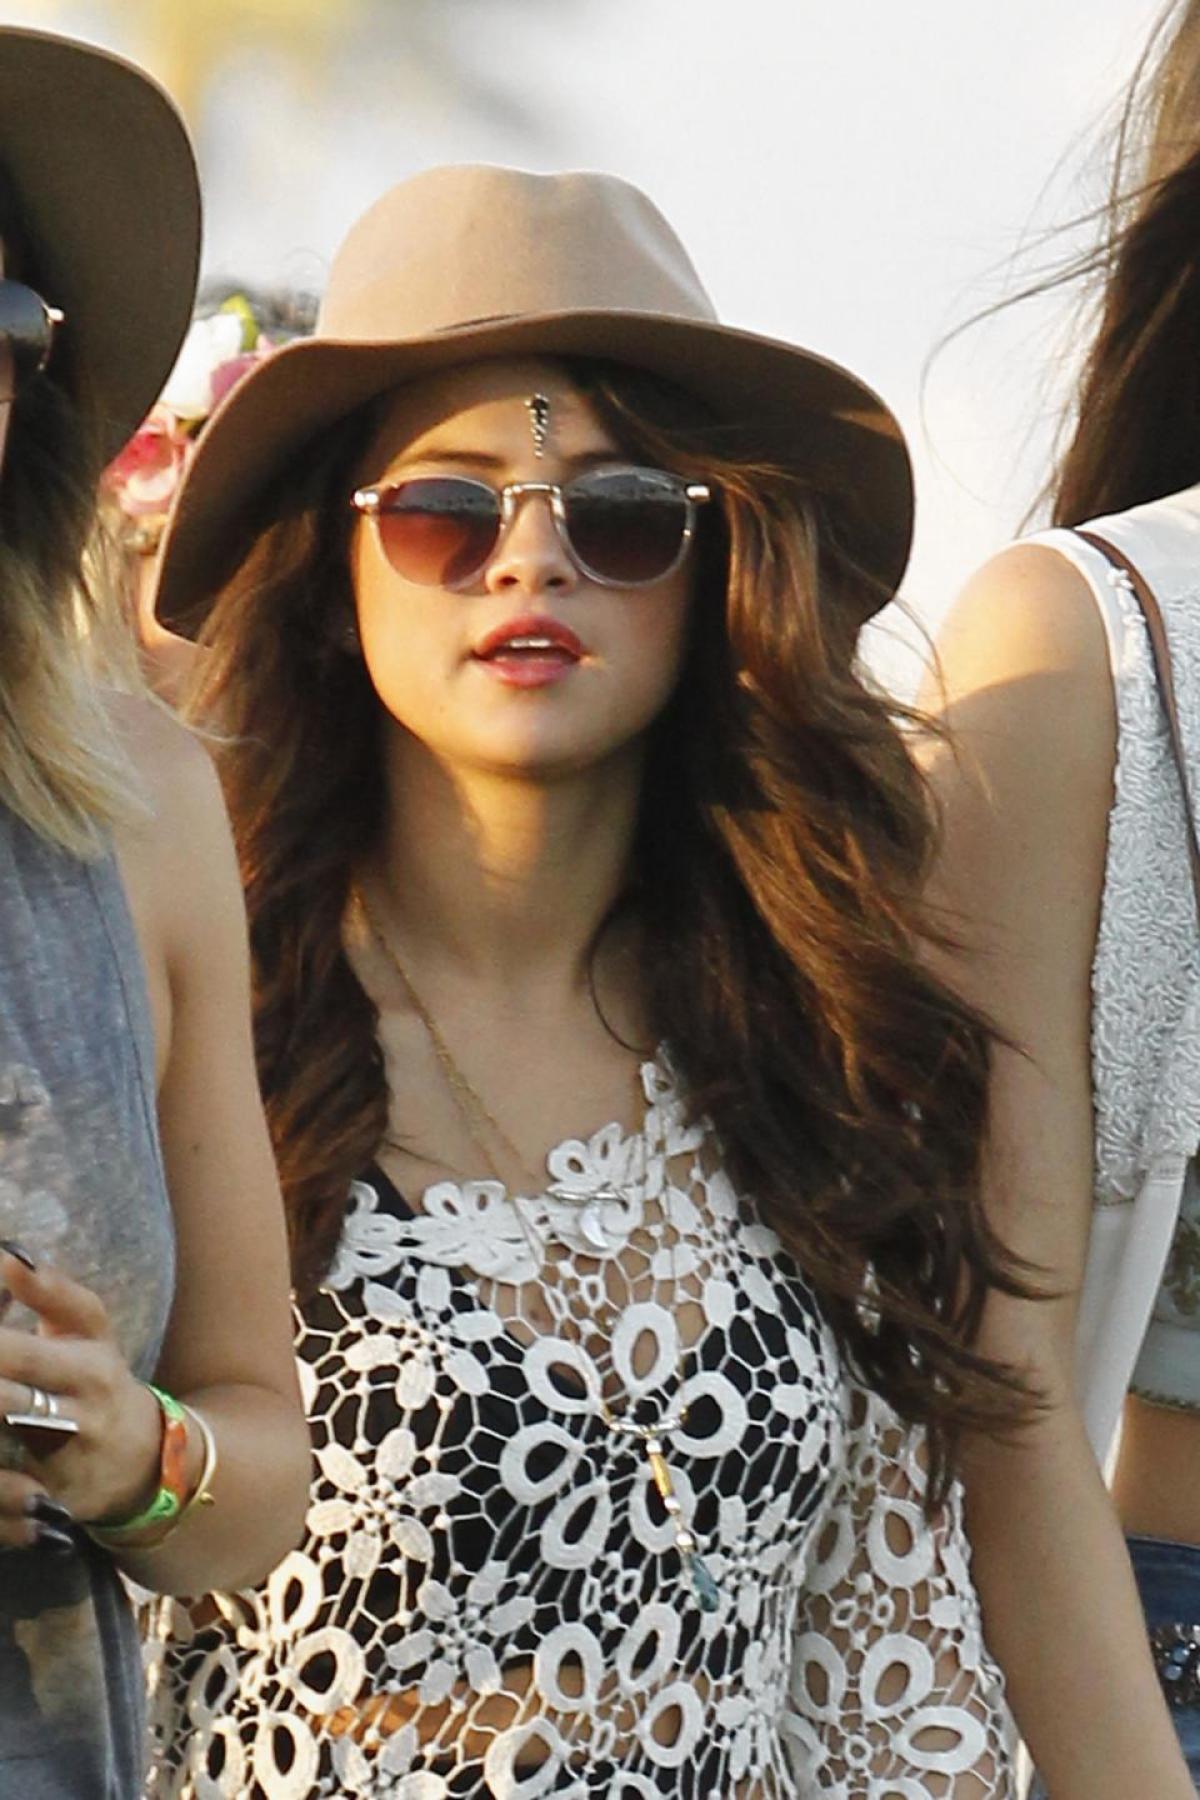 Justin Bieber và Selena Gomez thân mật tại lễ hội Coachella - Ảnh 4